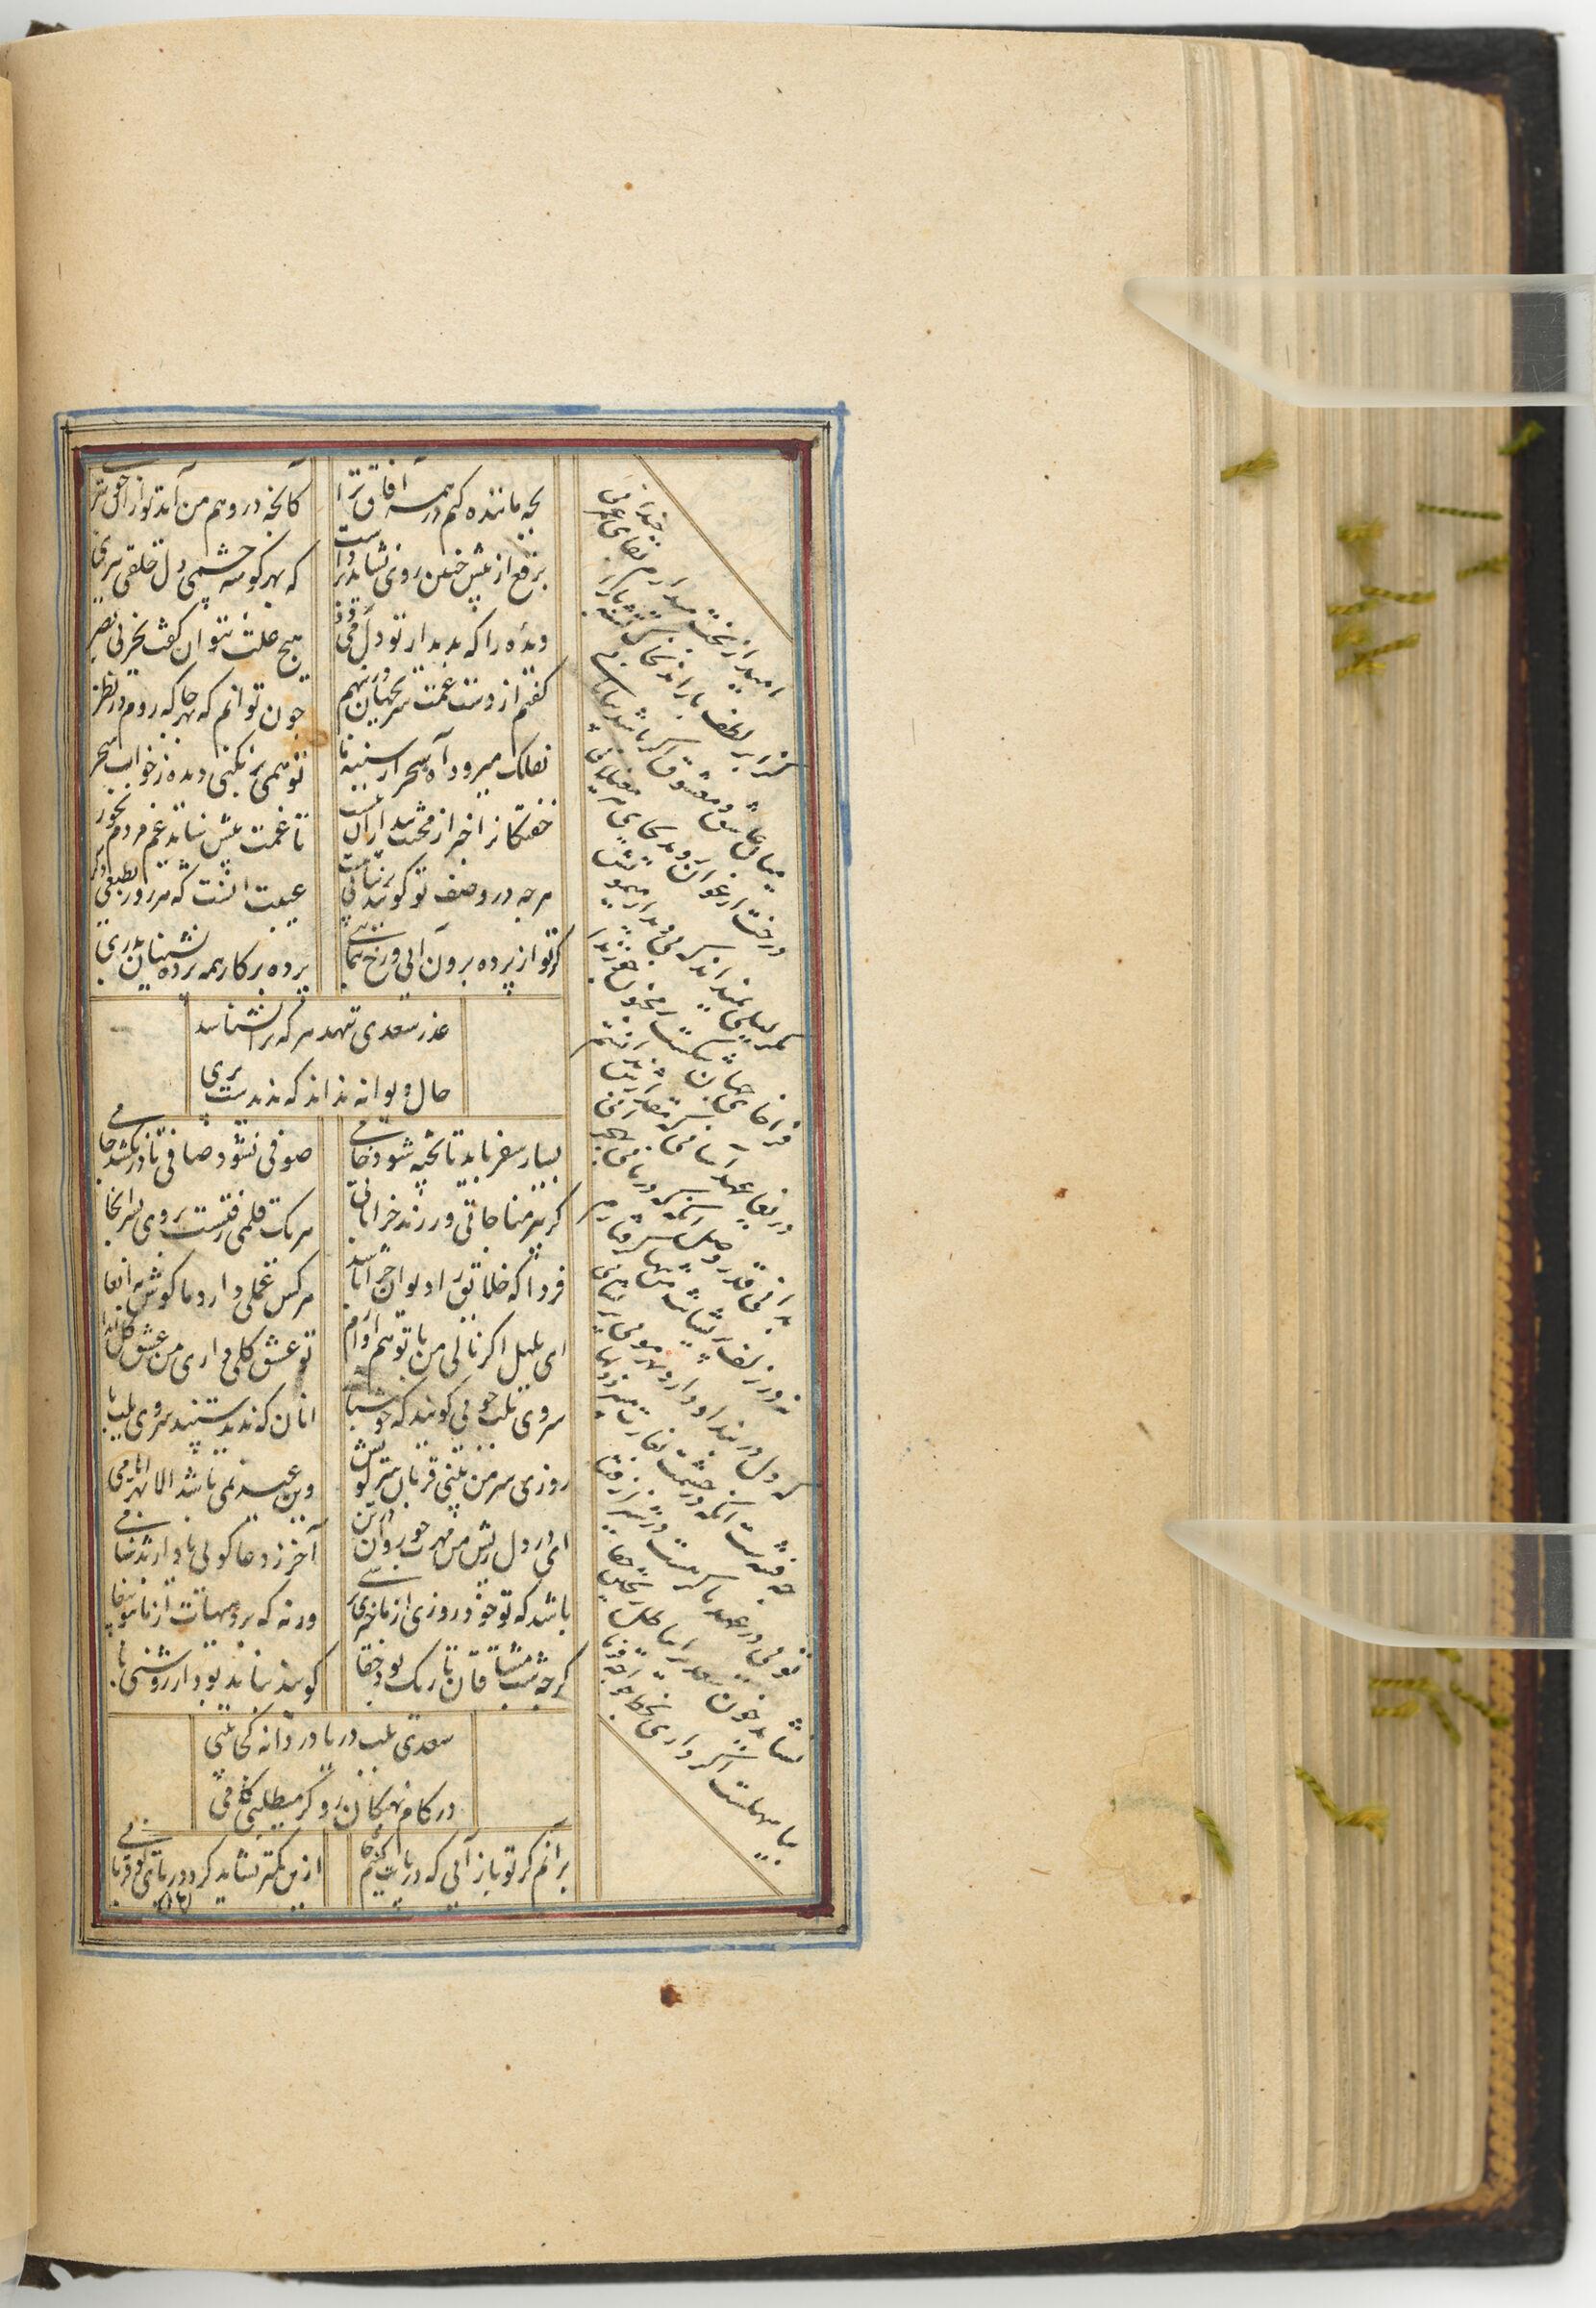 Text Folio (Text Recto; Text Verso Of Folio 287), From A Manuscript Of The Kulliyat Of Sa'di